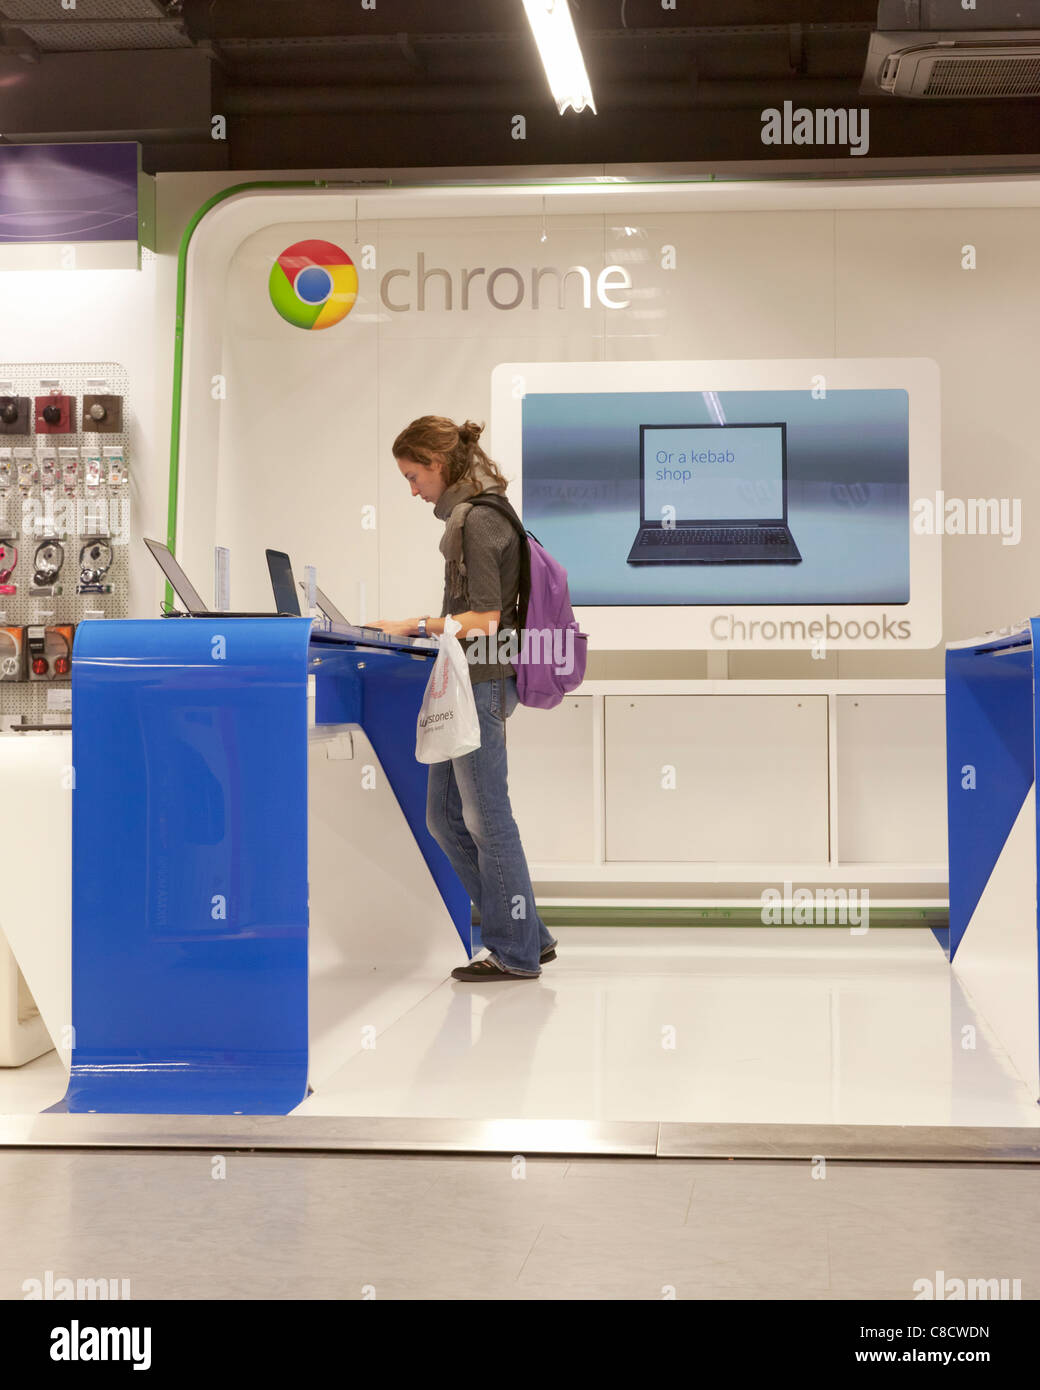 Google Chrome Stock Photos & Google Chrome Stock Images - Alamy